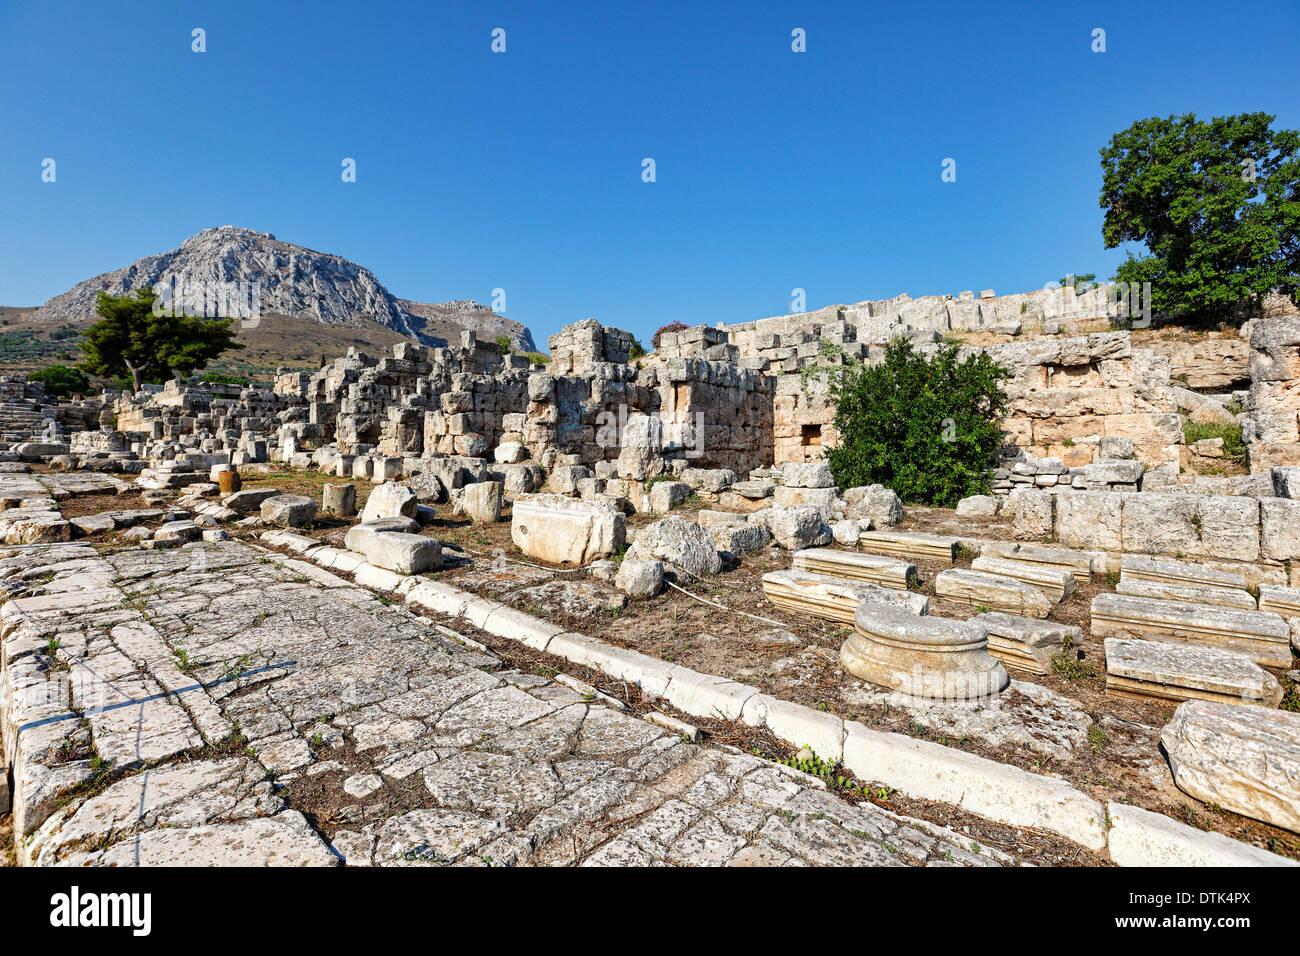 Lechaion-Straße im antiken Korinth, Griechenland Stockbild